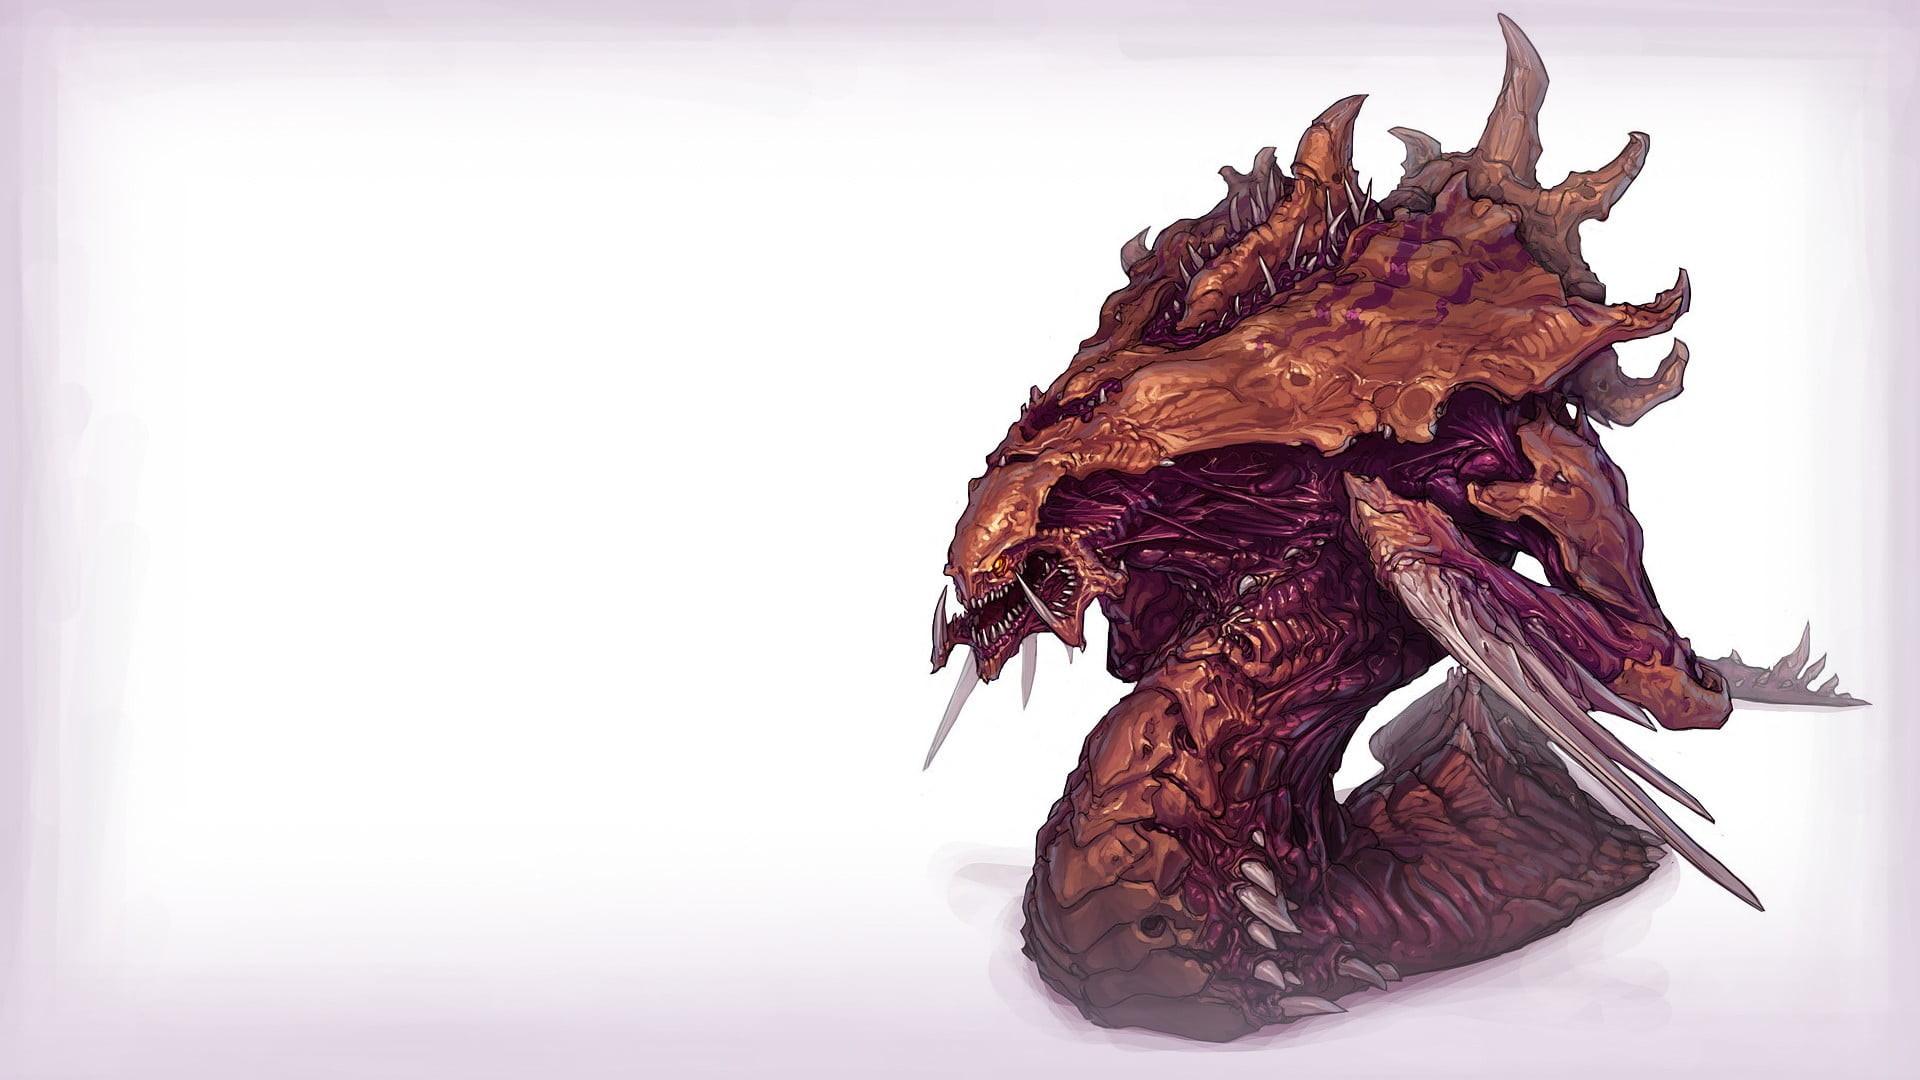 Res: 1920x1080, brown and purple dragon wallpaper HD wallpaper